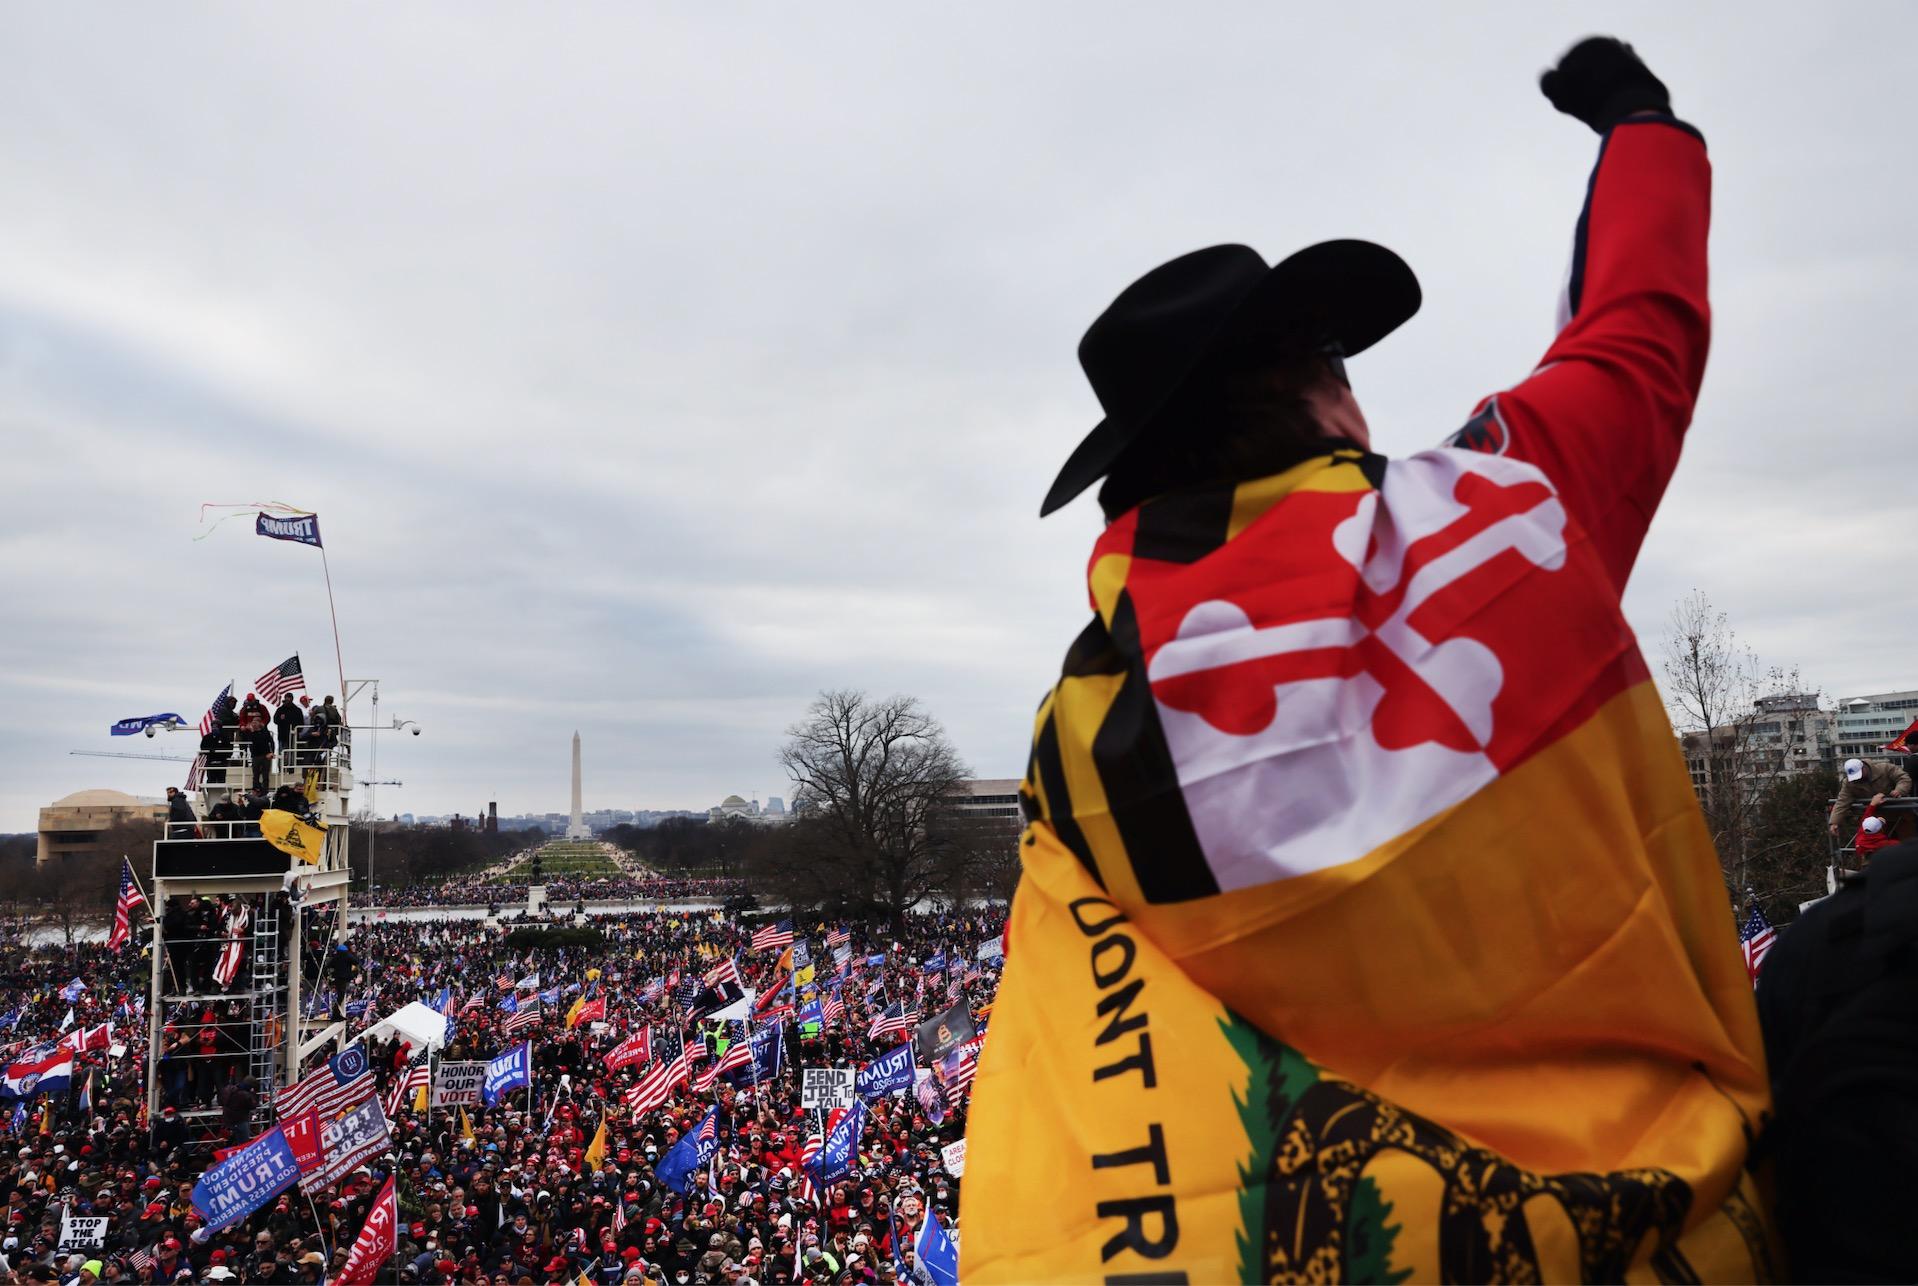 Rally Spencer Platt/Getty Images